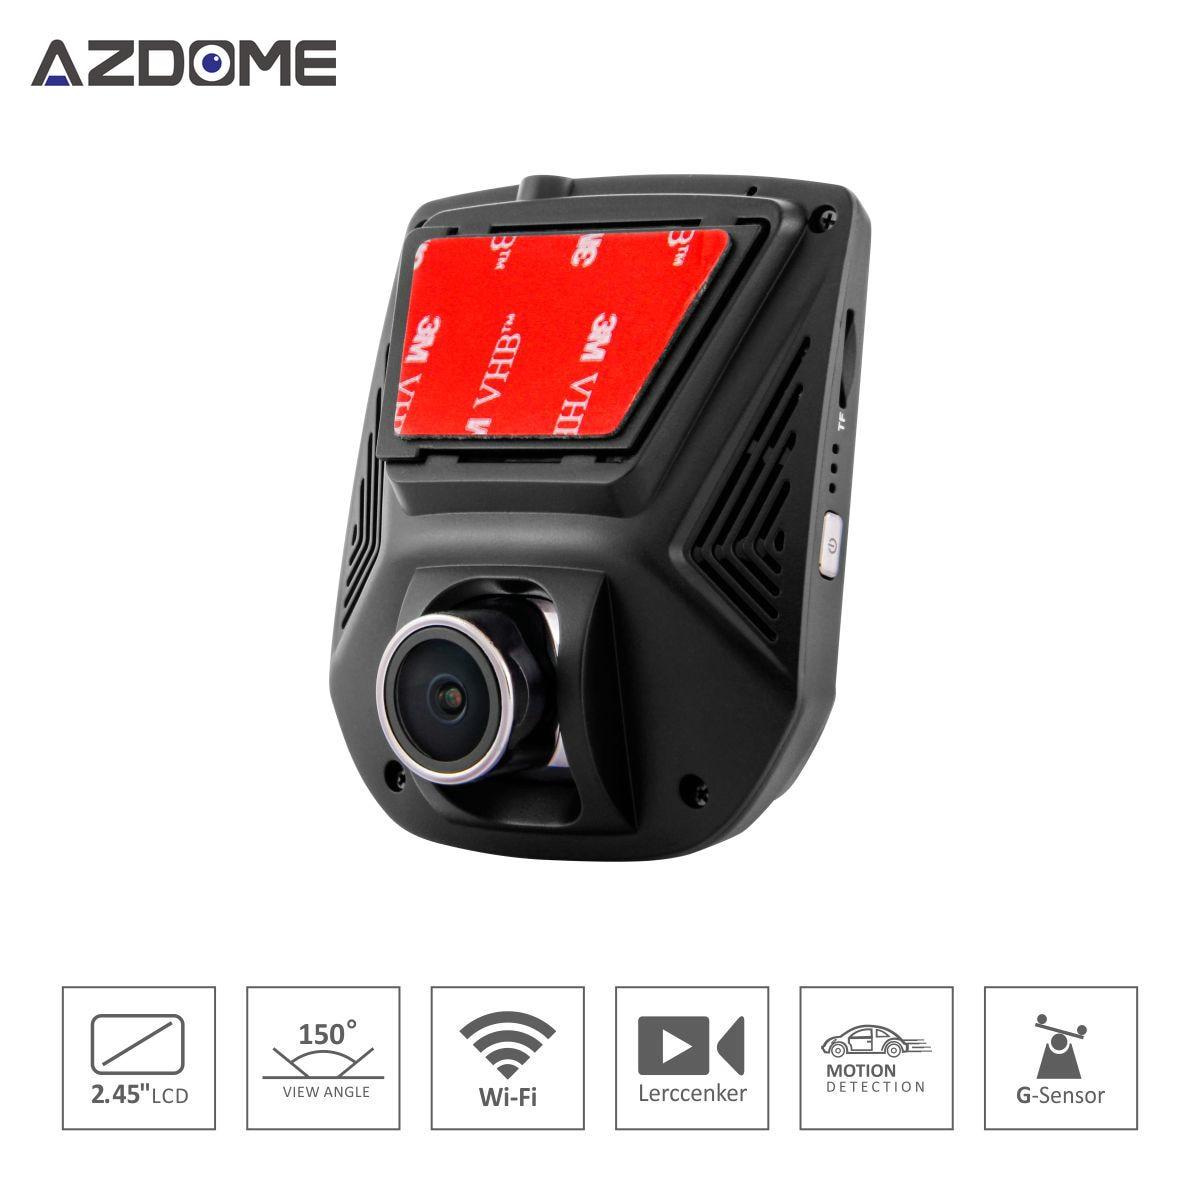 A305 Novatek 96658 Full HD1080P WiFi Car Camera DVR 2.45 inch Display IPS G-Sensor Sony IMX323 Video Recorder Dash Cam for honda ridgeline novatek 96658 fhd 1080p car driving video recorder mini dvr wifi camera black box dash cam